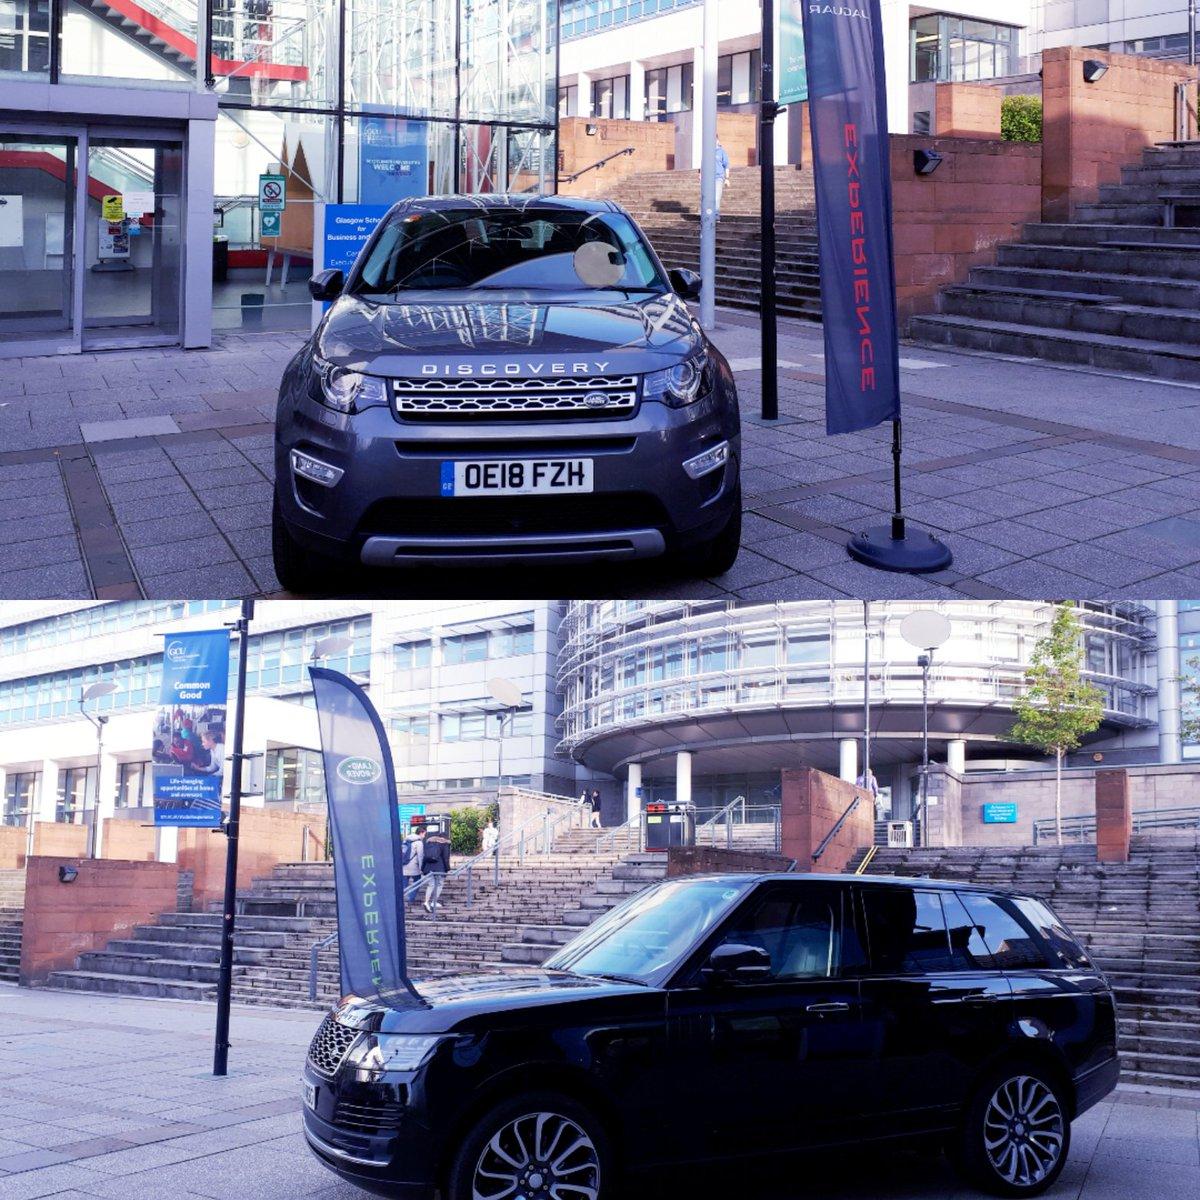 Gcu Careers Service On Twitter Jaguar Land Rover At Gcu Today For